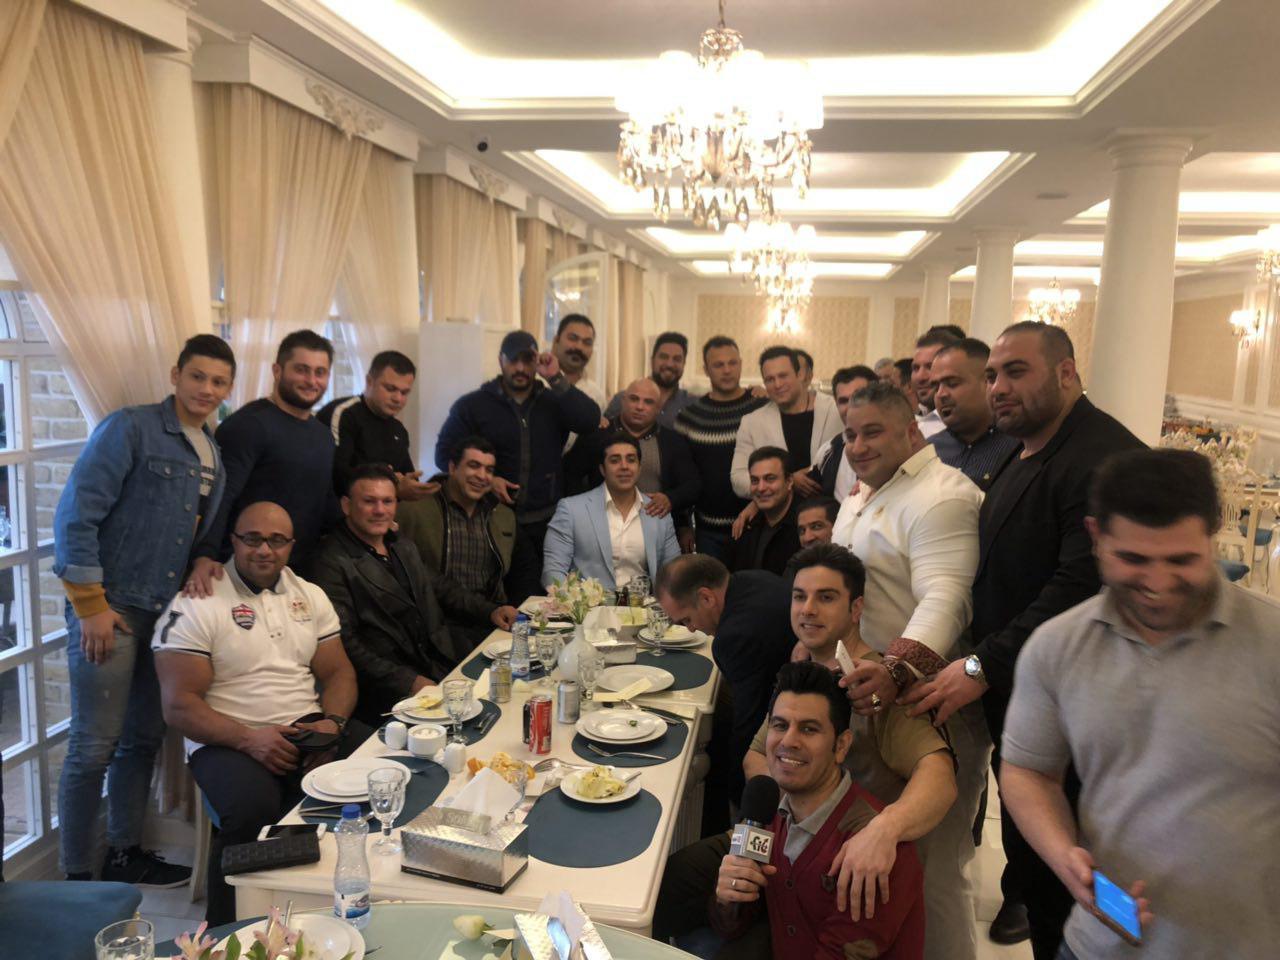 photo_2018-12-27_16-47-00  اولین گردهمایی قویترین مردان پایتخت photo 2018 12 27 16 47 00